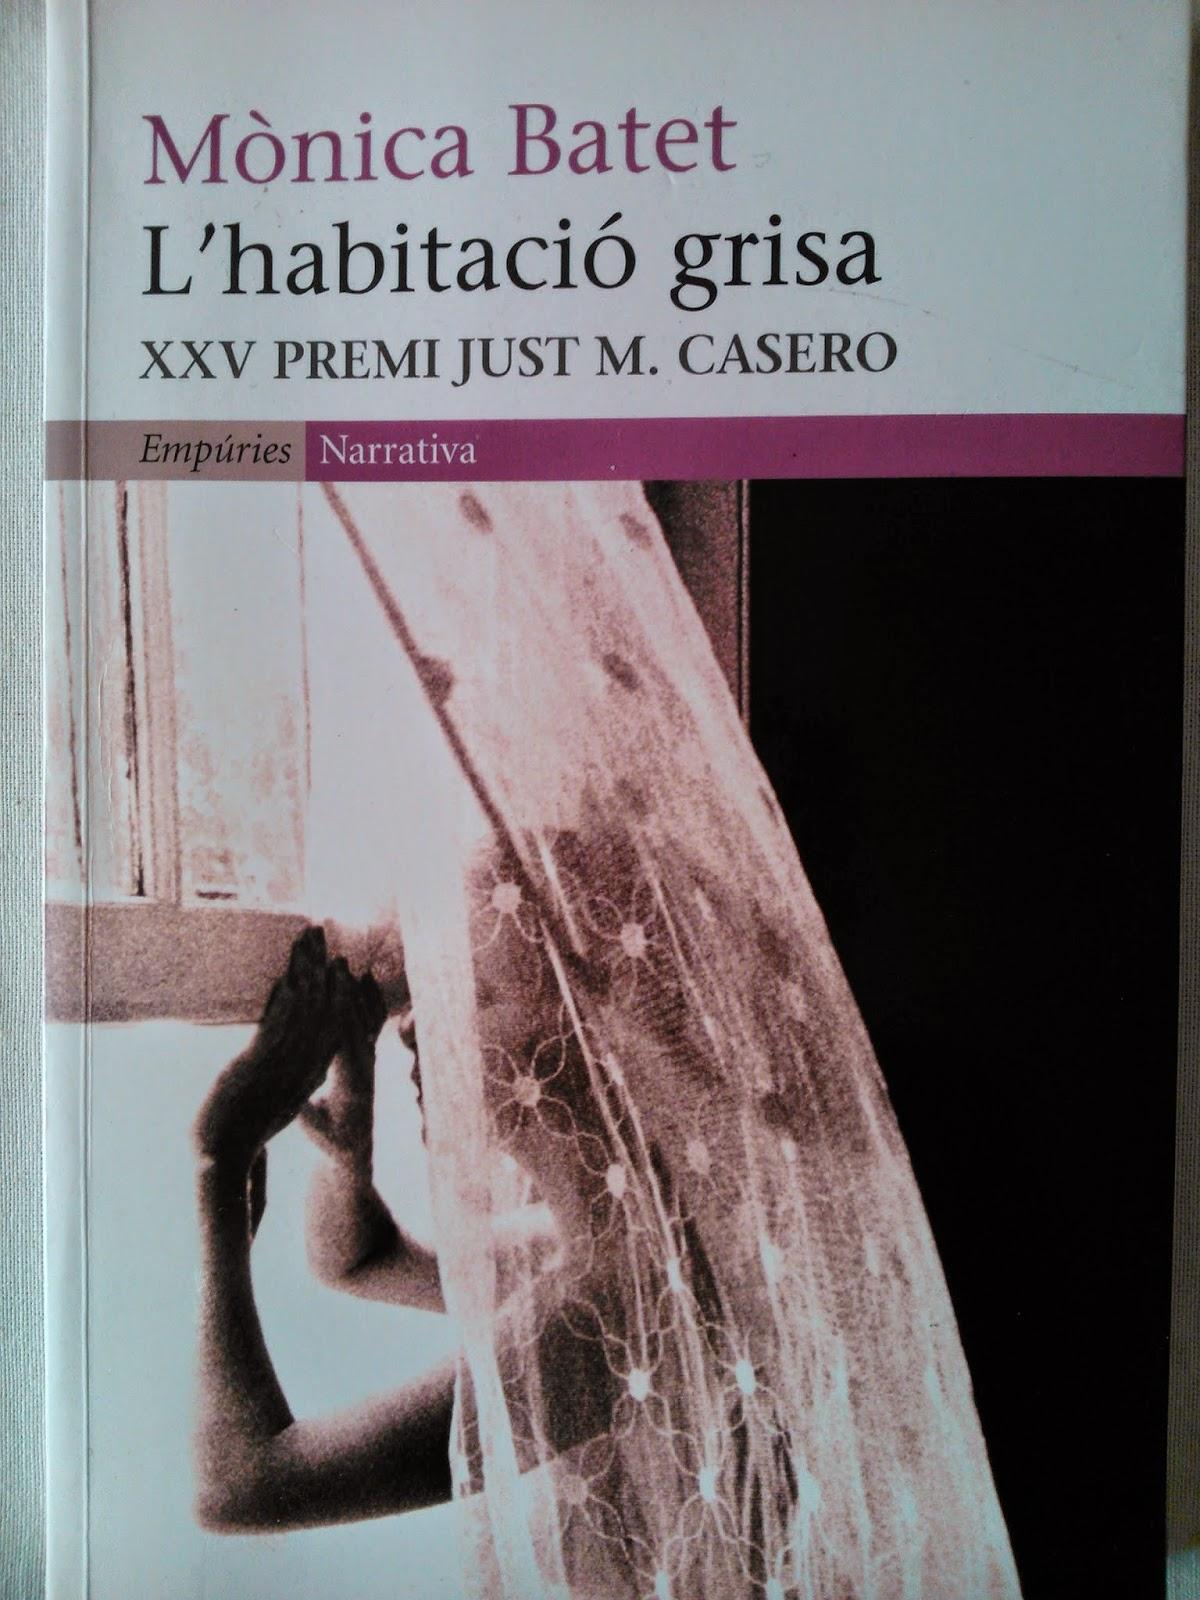 http://www.grup62.cat/llibre-lhabitacio-grisa-107819.html